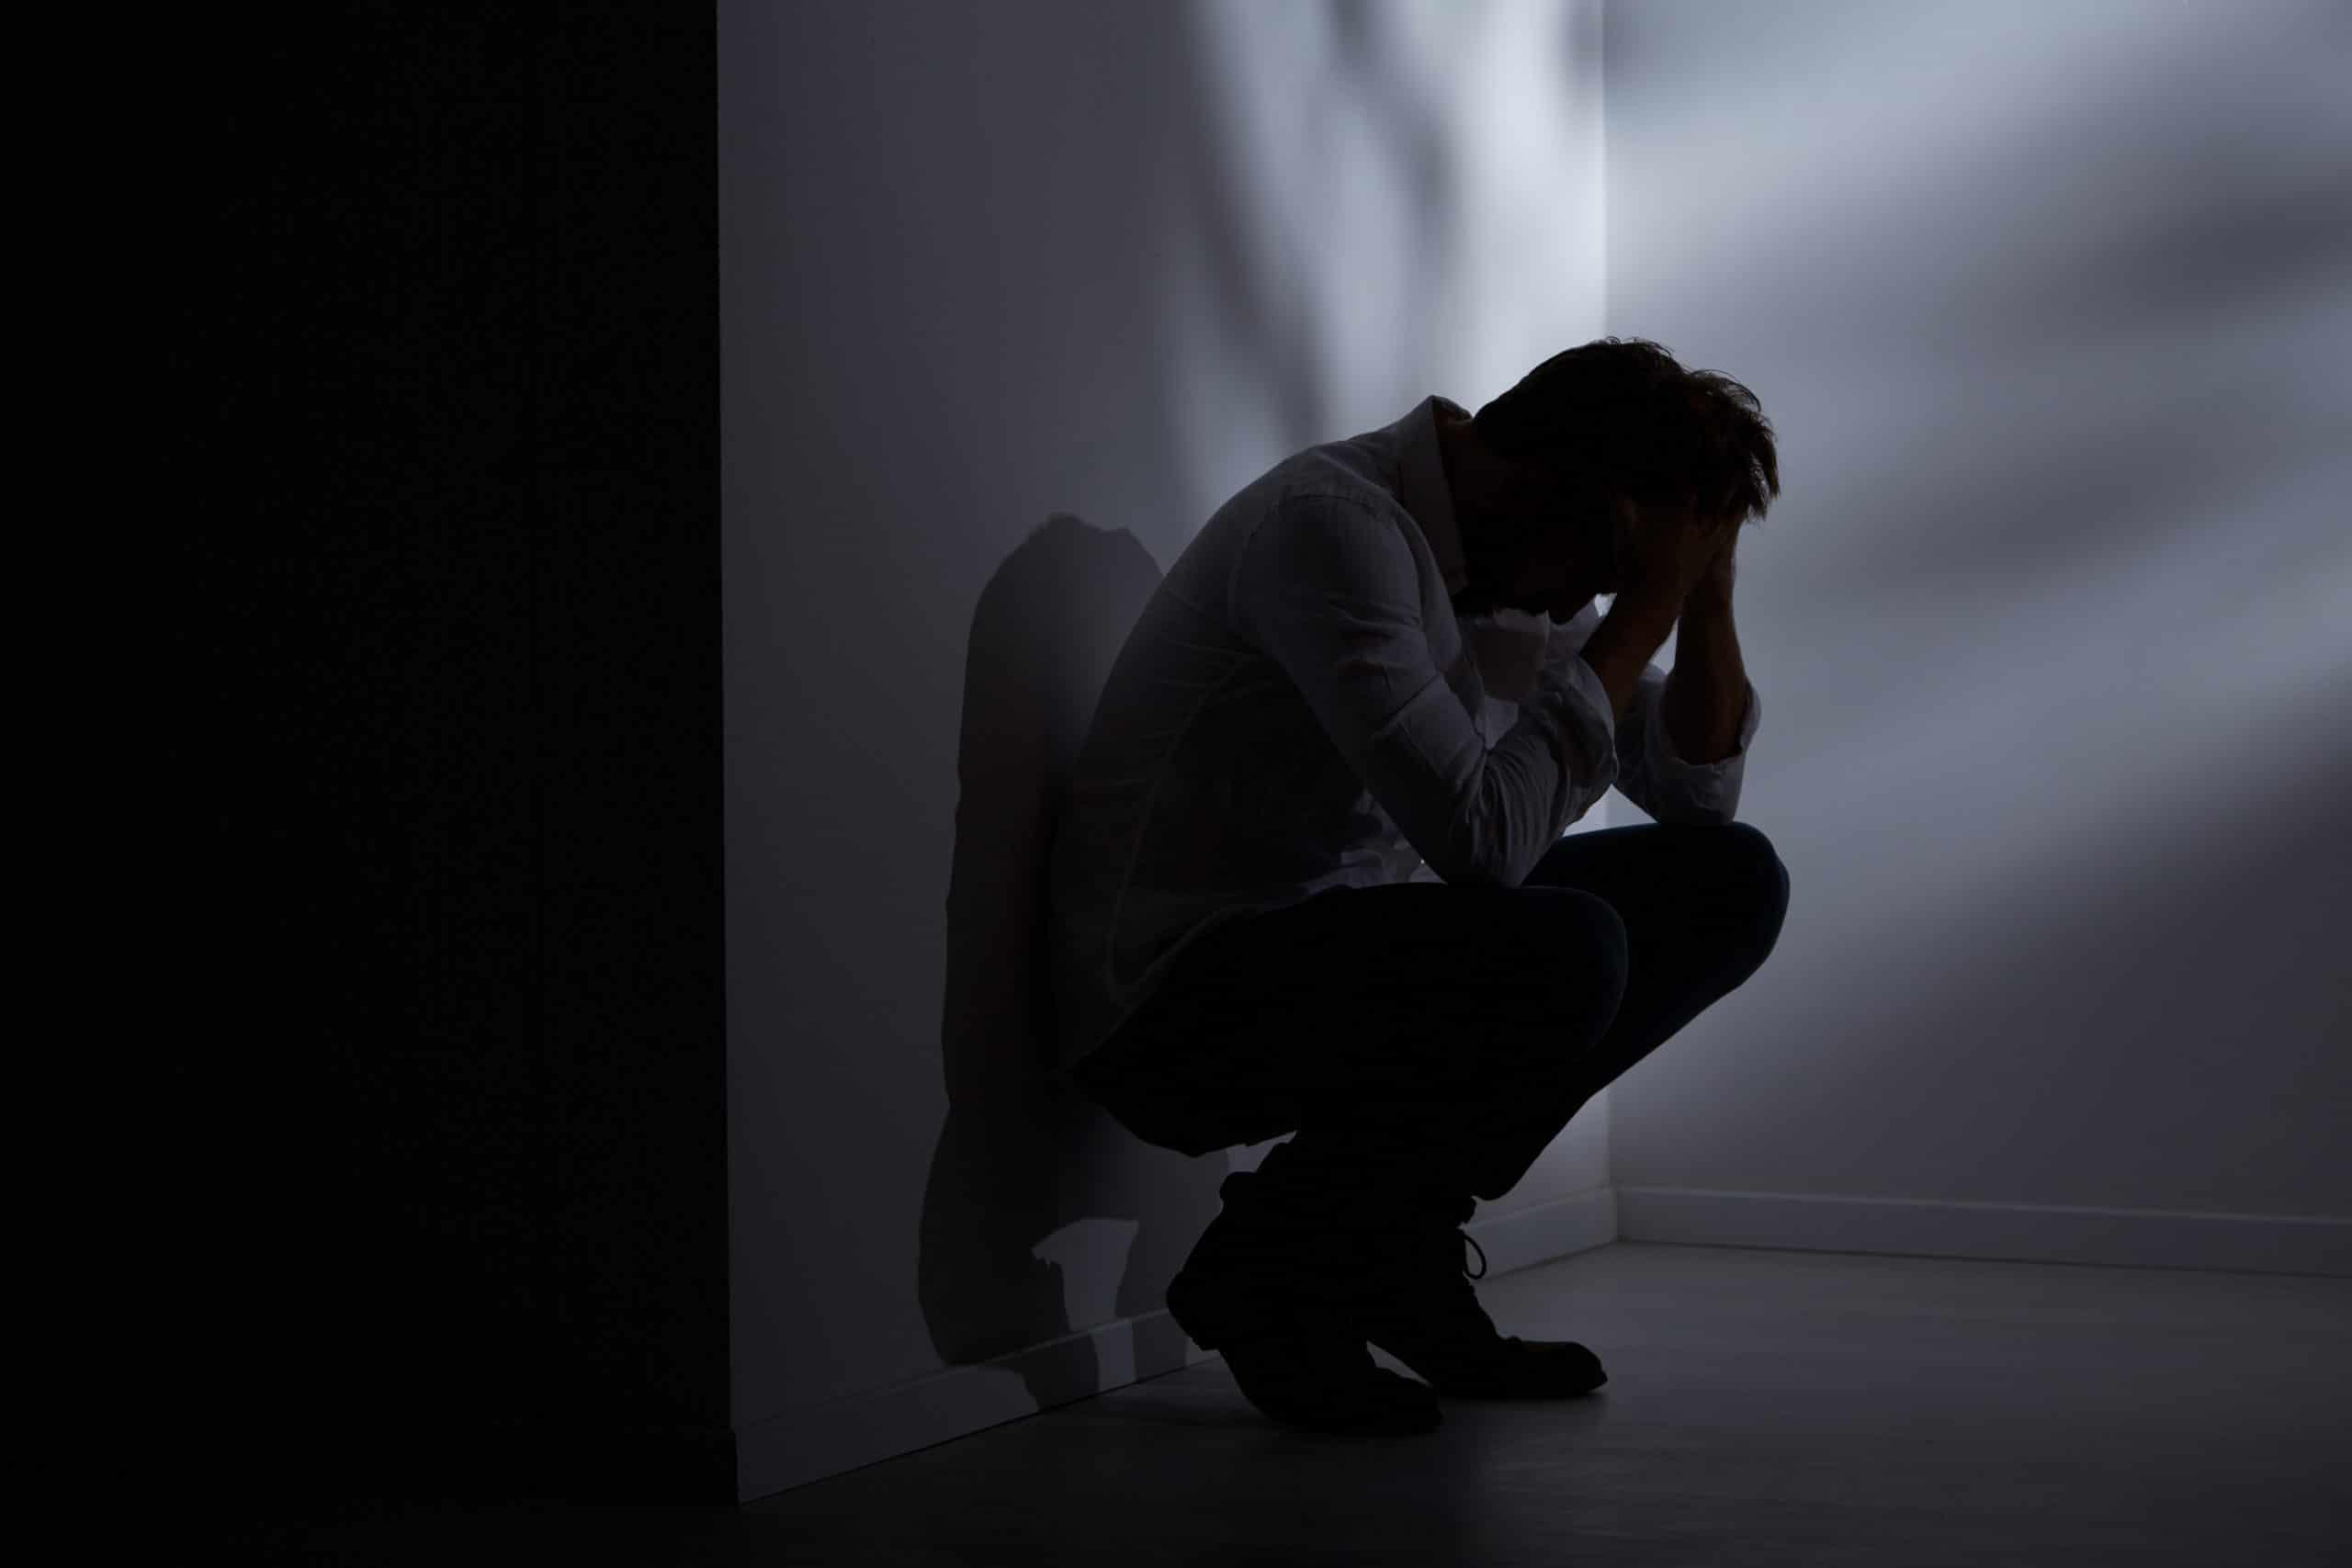 Dual Diagnosis Treatment: Schizophrenia And Addiction